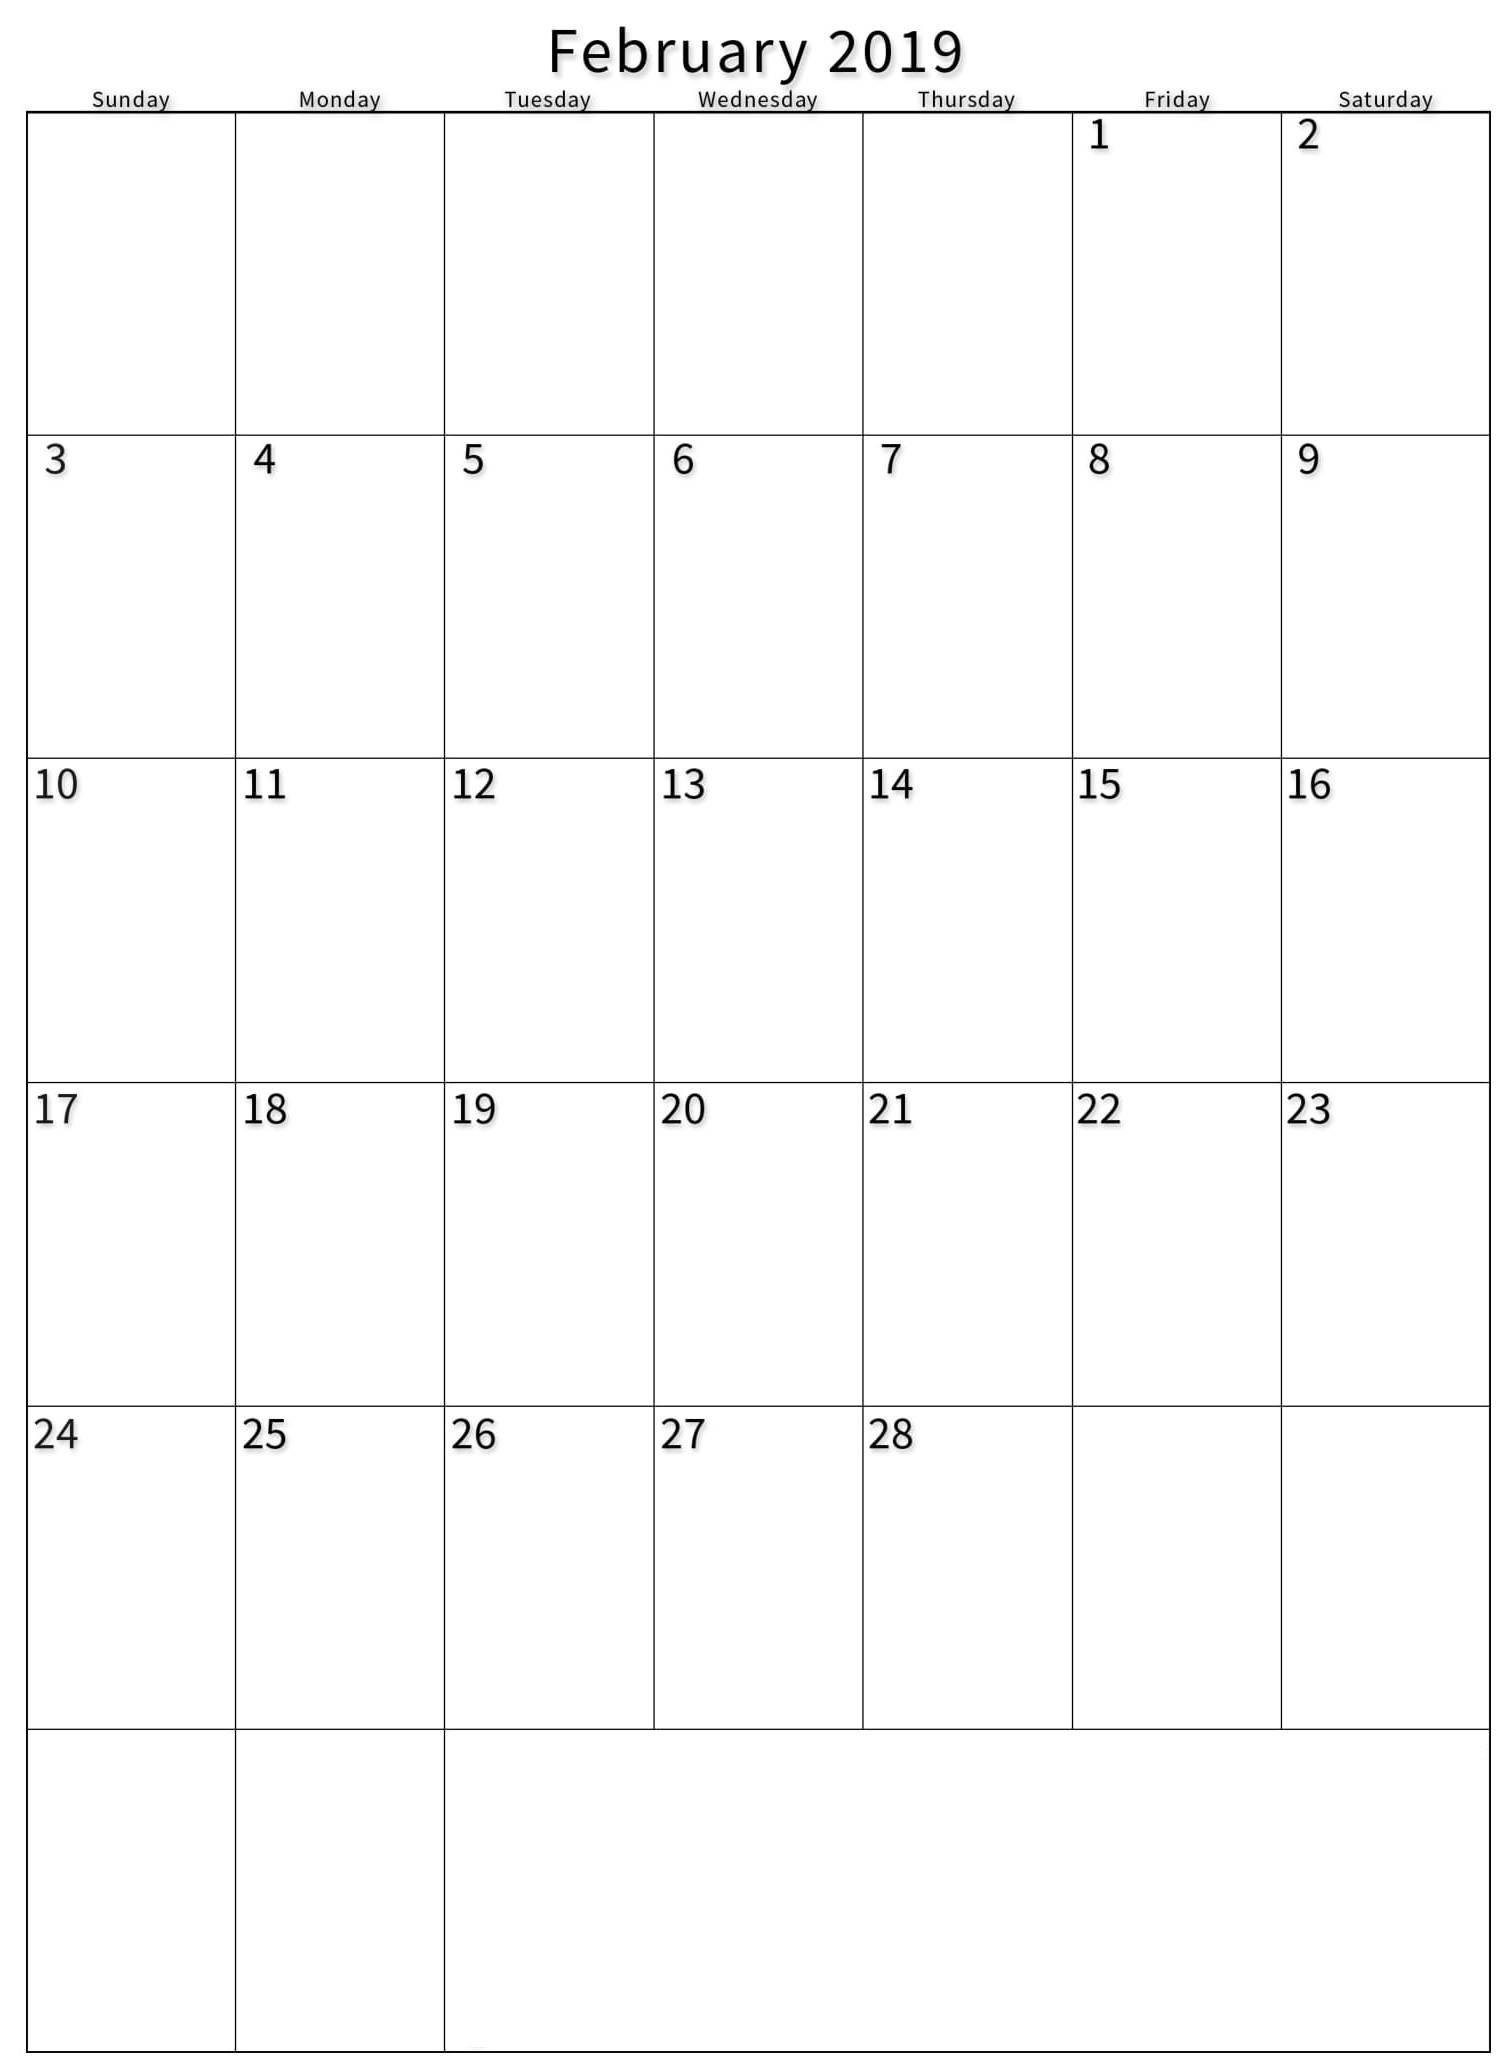 February 2019 Vertical Calendar Printable - Printable Calendar Templates_Blank Calendar Template Vertical